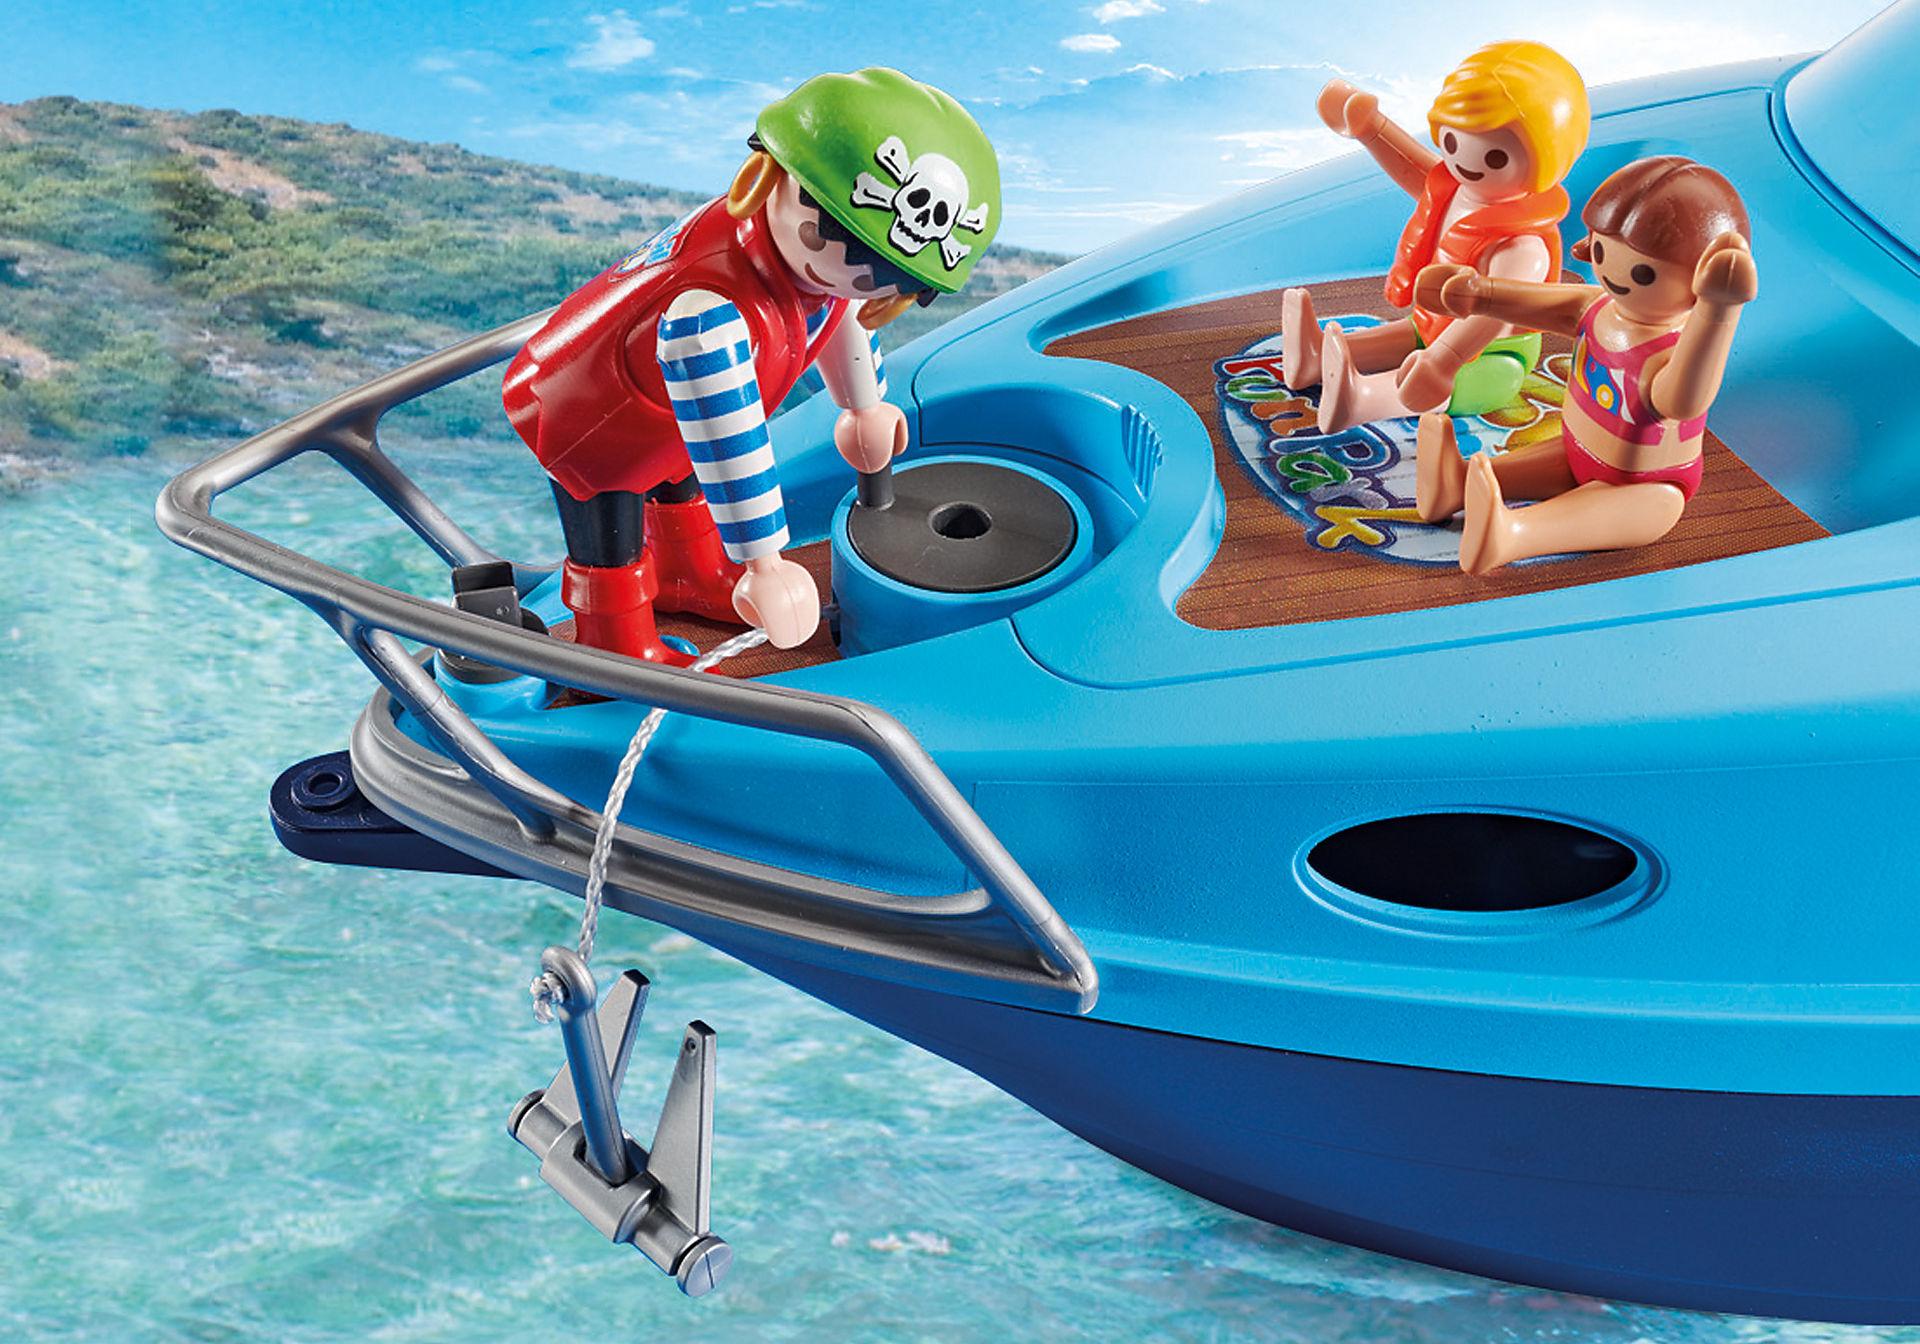 70630 PLAYMOBIL Funpark Yate con moto de agua zoom image5